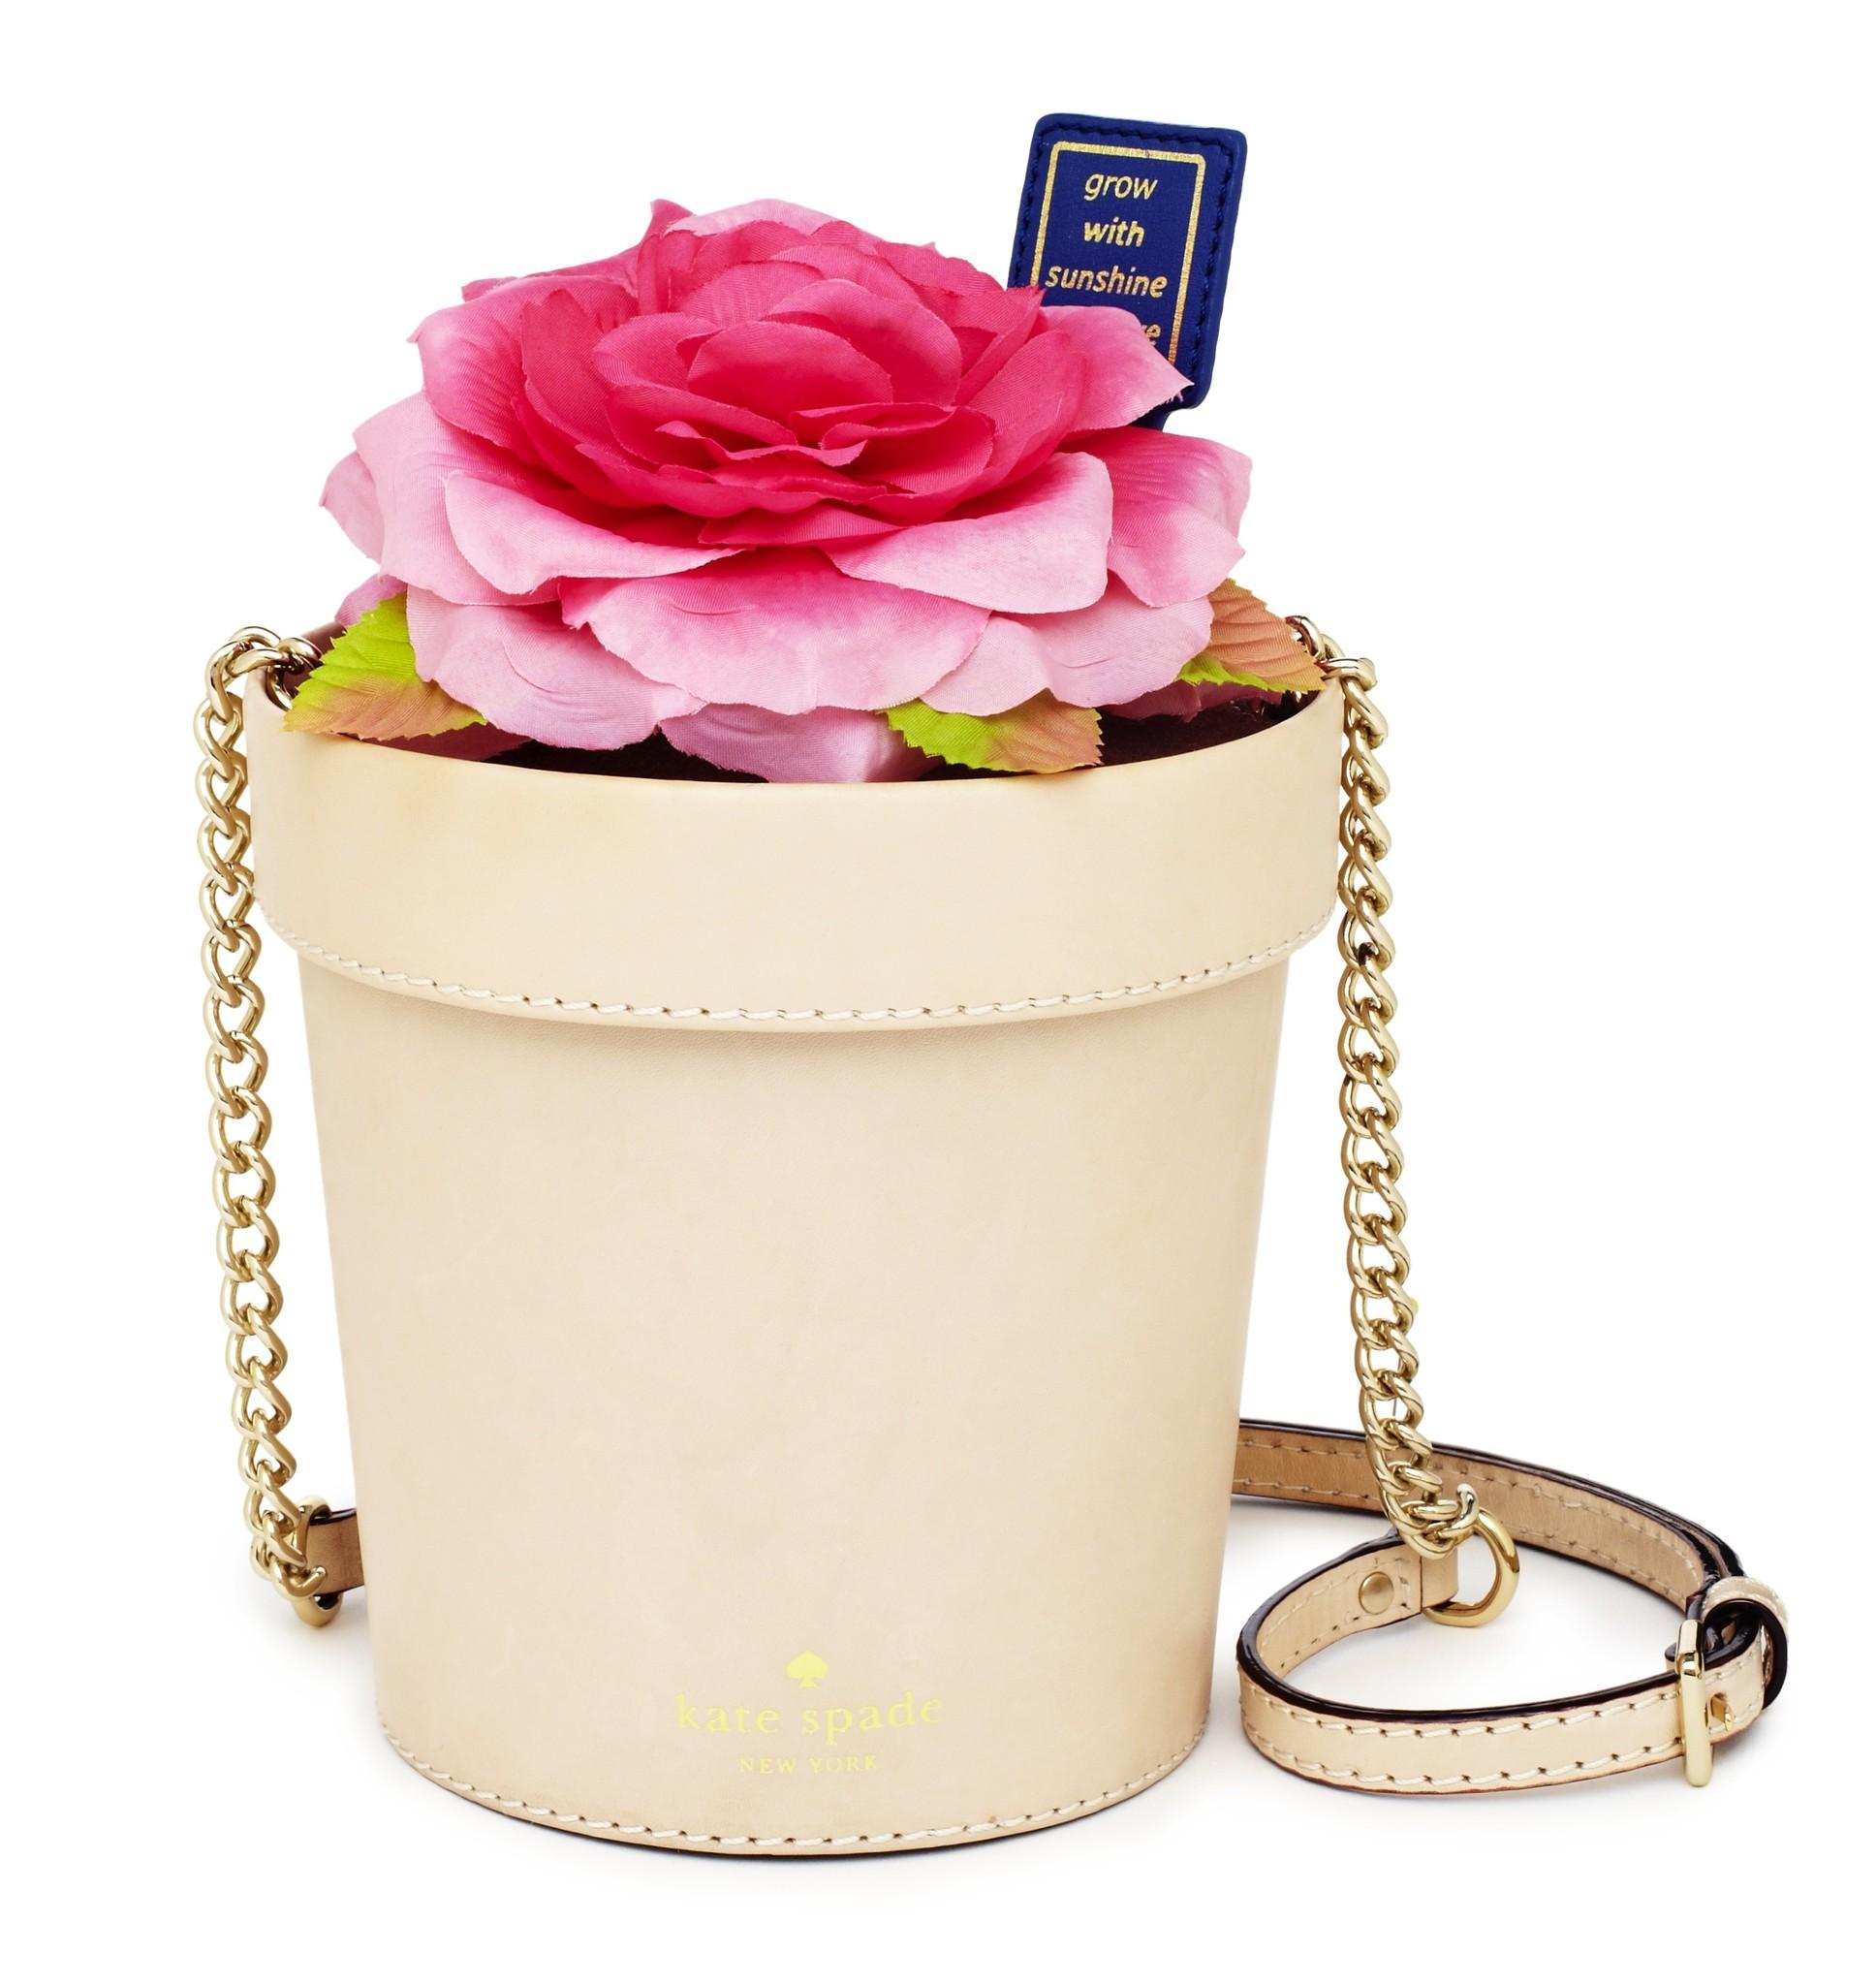 Kate Spade New York vachetta leather Spring Forward flowerpot cross-body bag, $328 at katespade.com